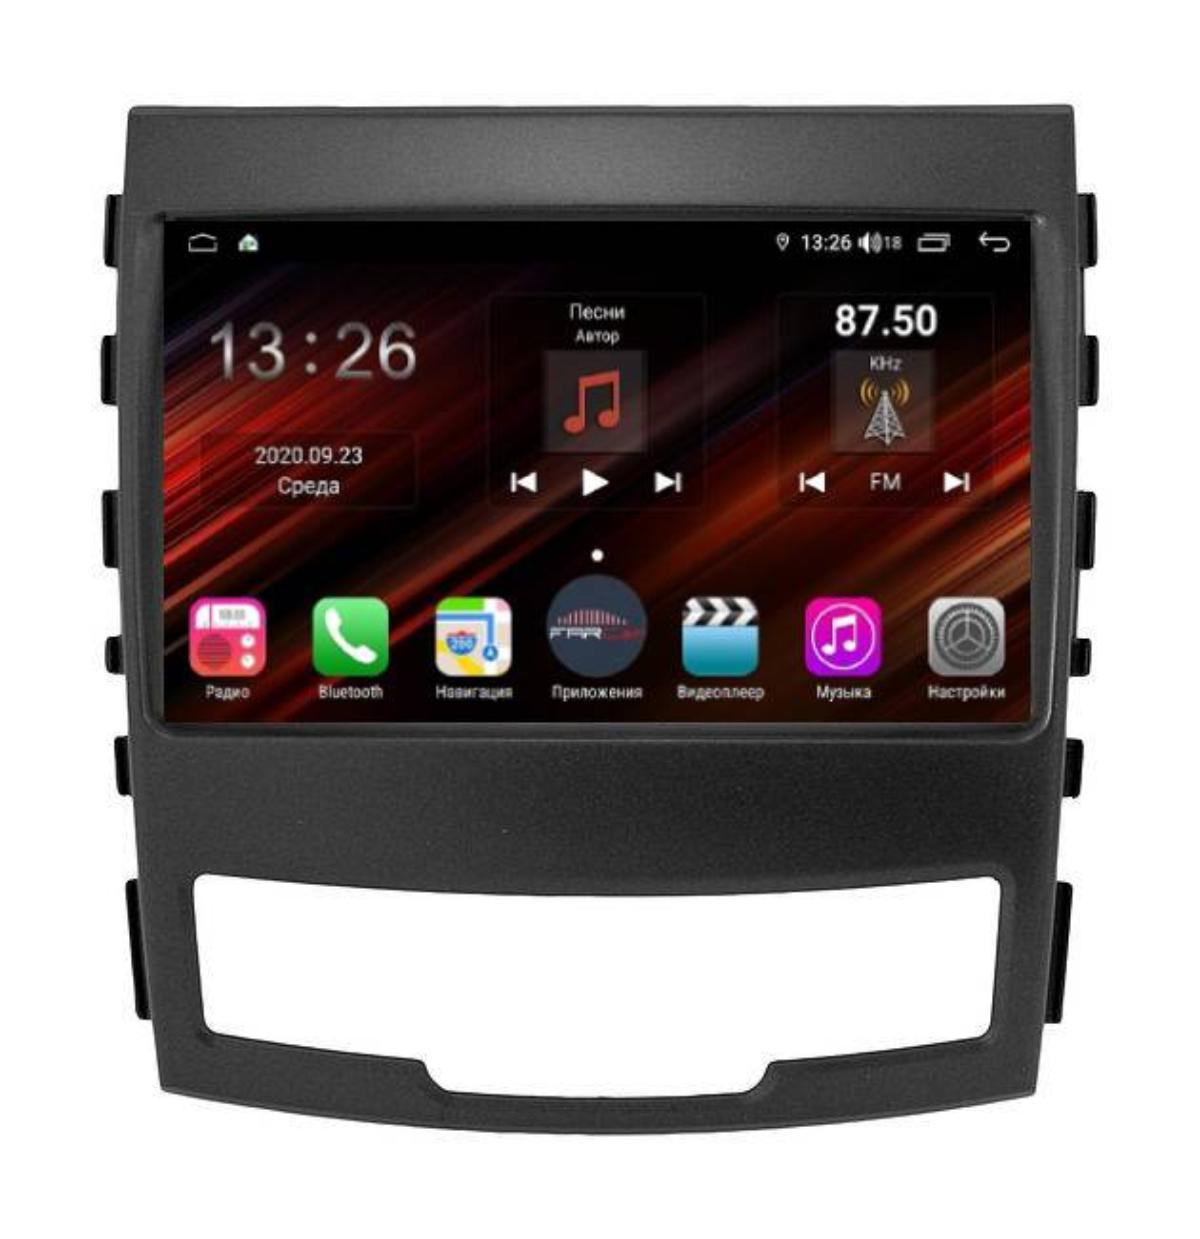 Штатная магнитола FarCar s400 Super HD для Ssang Yong Actyon new на Android (XH159R) (+ Камера заднего вида в подарок!)